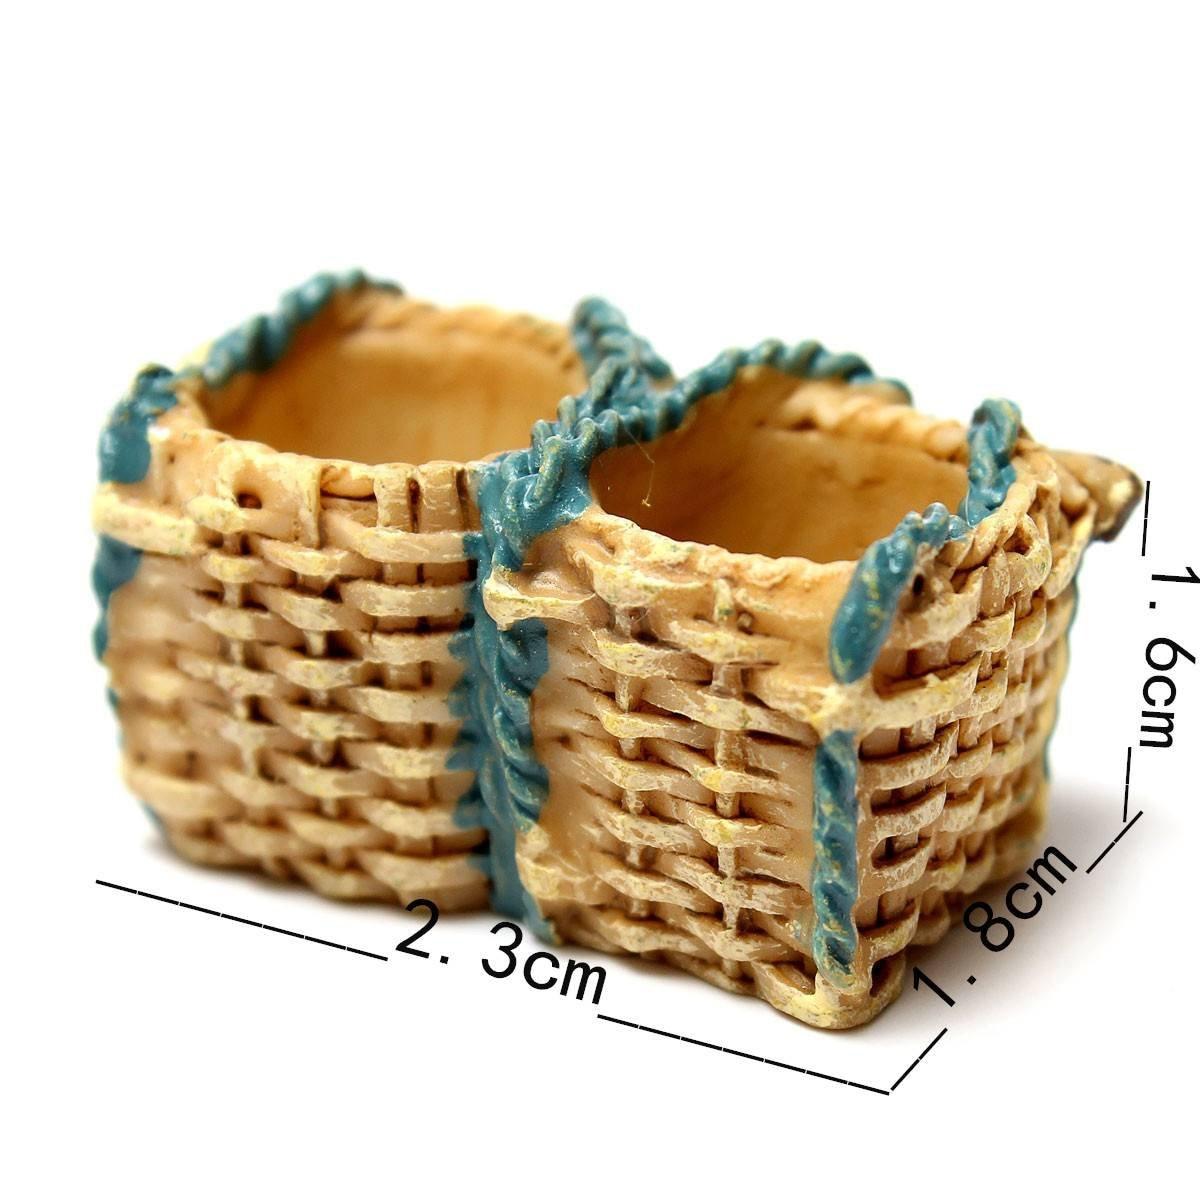 Miniatura jardín para casa de muñecas ornamento maceta plantas de manualidades decoración del hogar cestas de regalo de mimbre